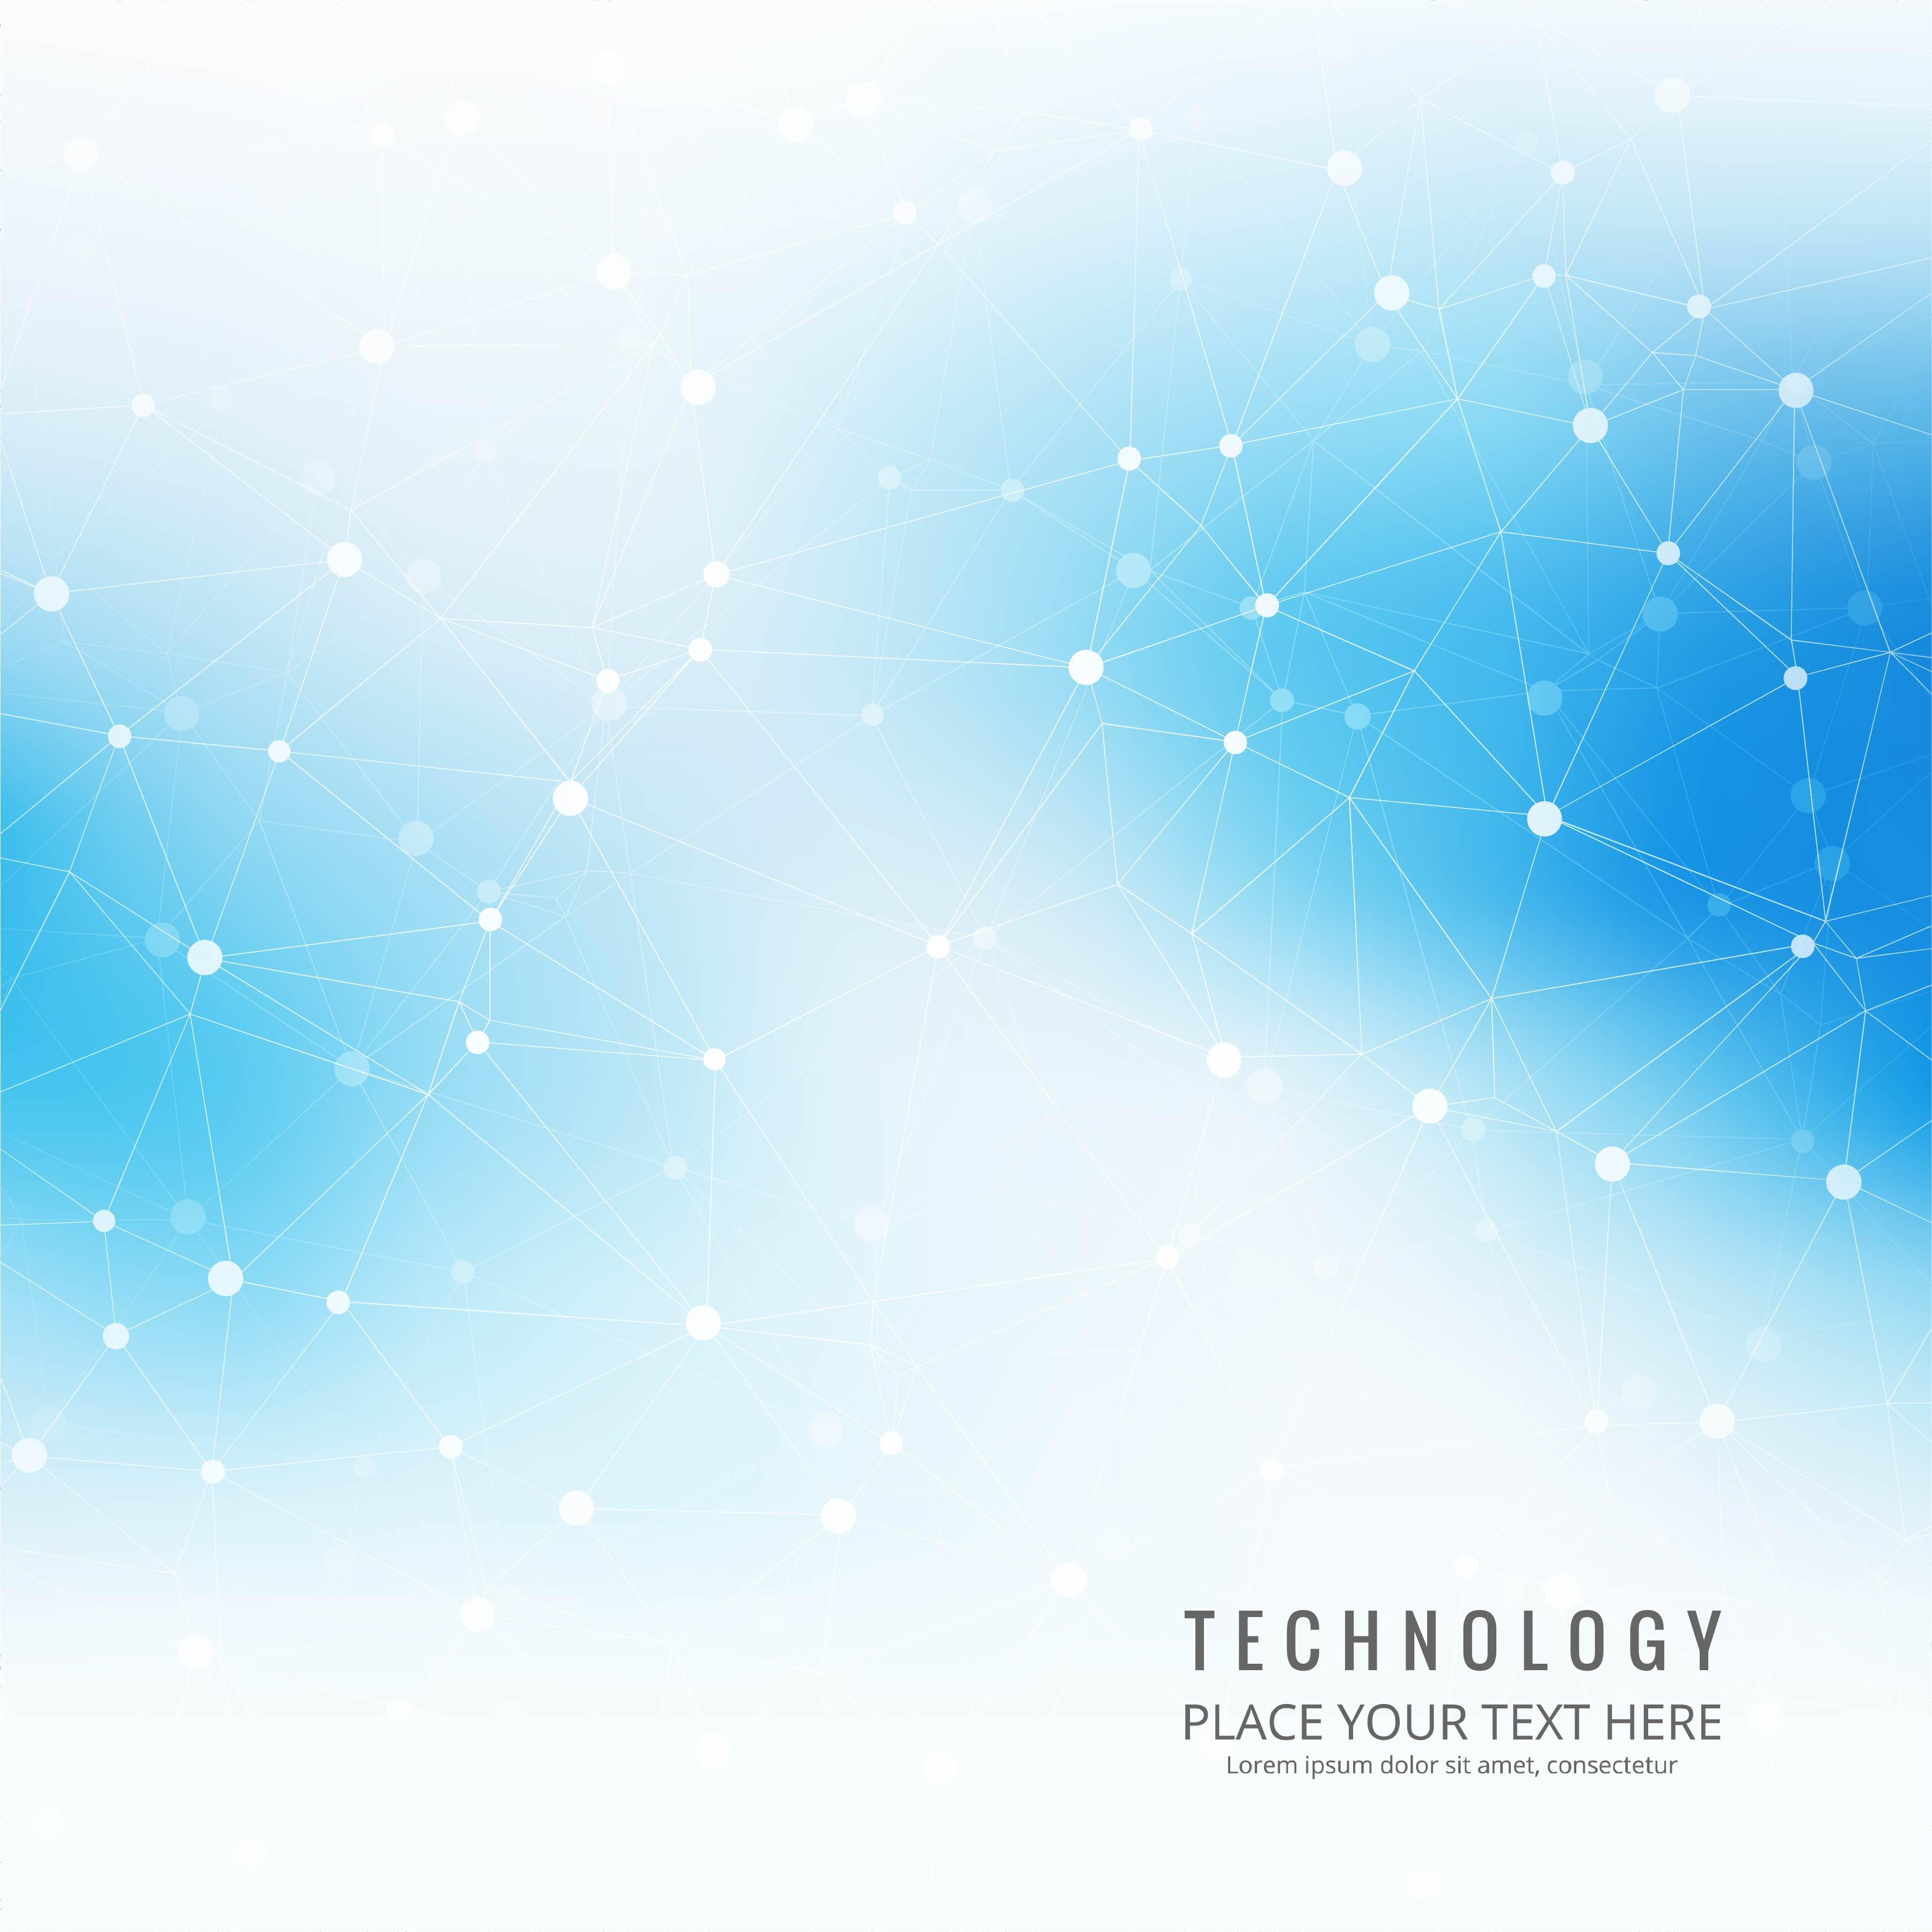 Blue Technology: Blue Technology Background Free Vector Art